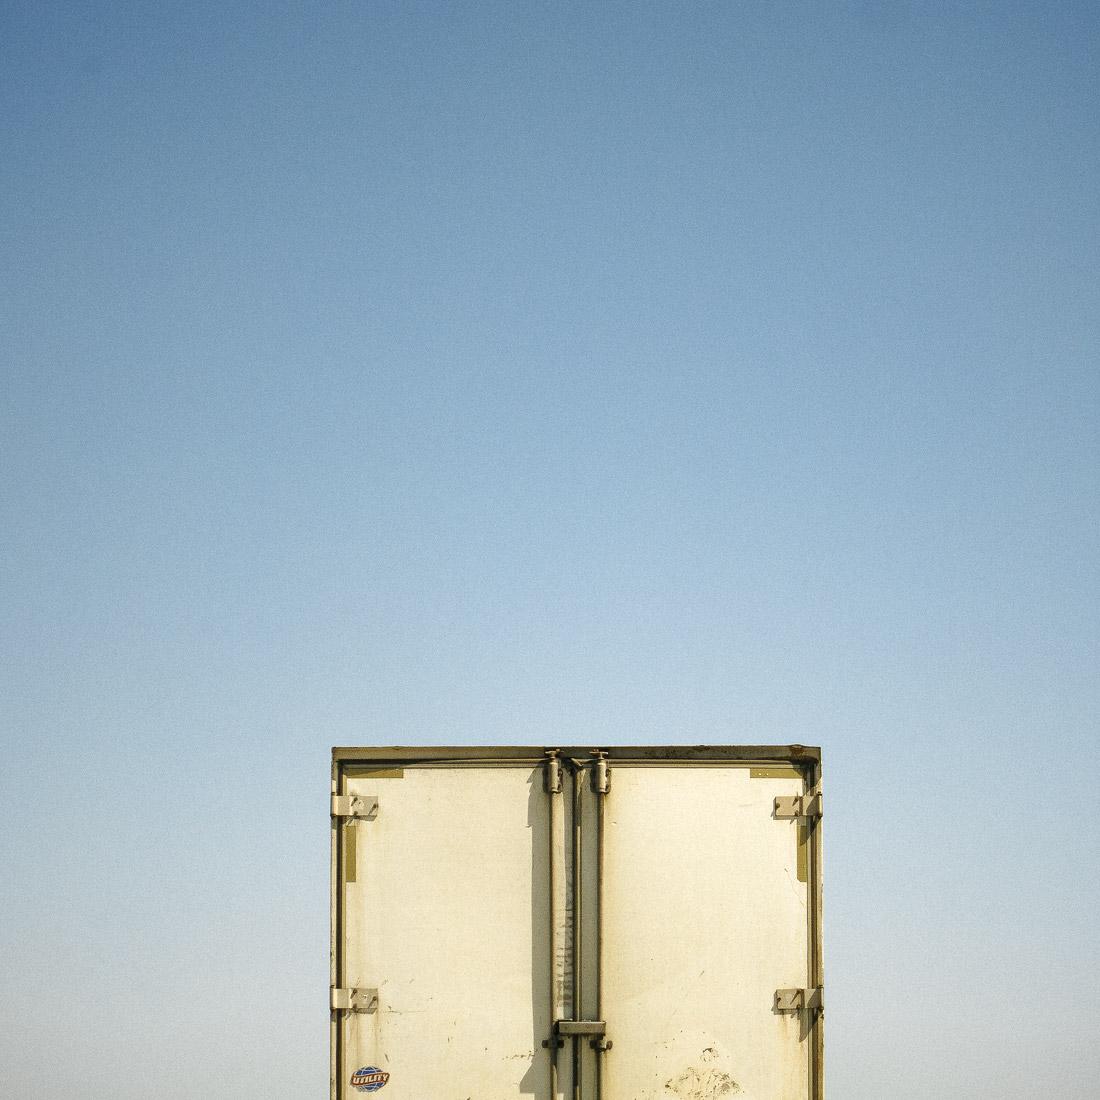 David Bernie Diurnal Affair Photography Project